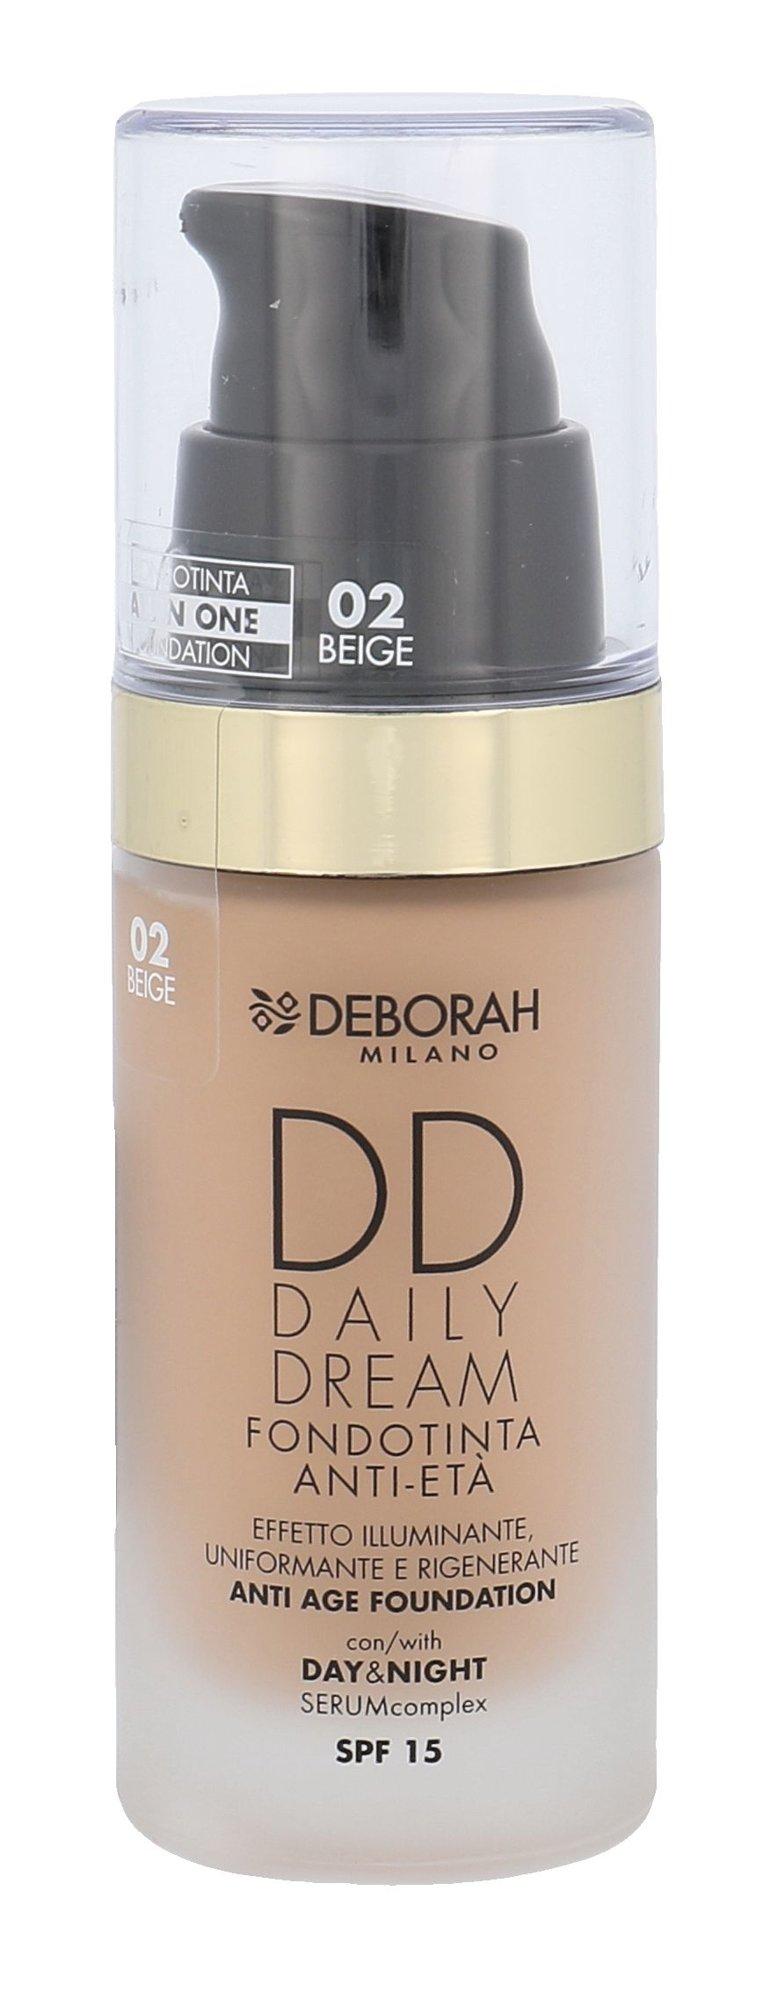 Deborah Milano DD Daily Dream Cosmetic 30ml 02 Beige